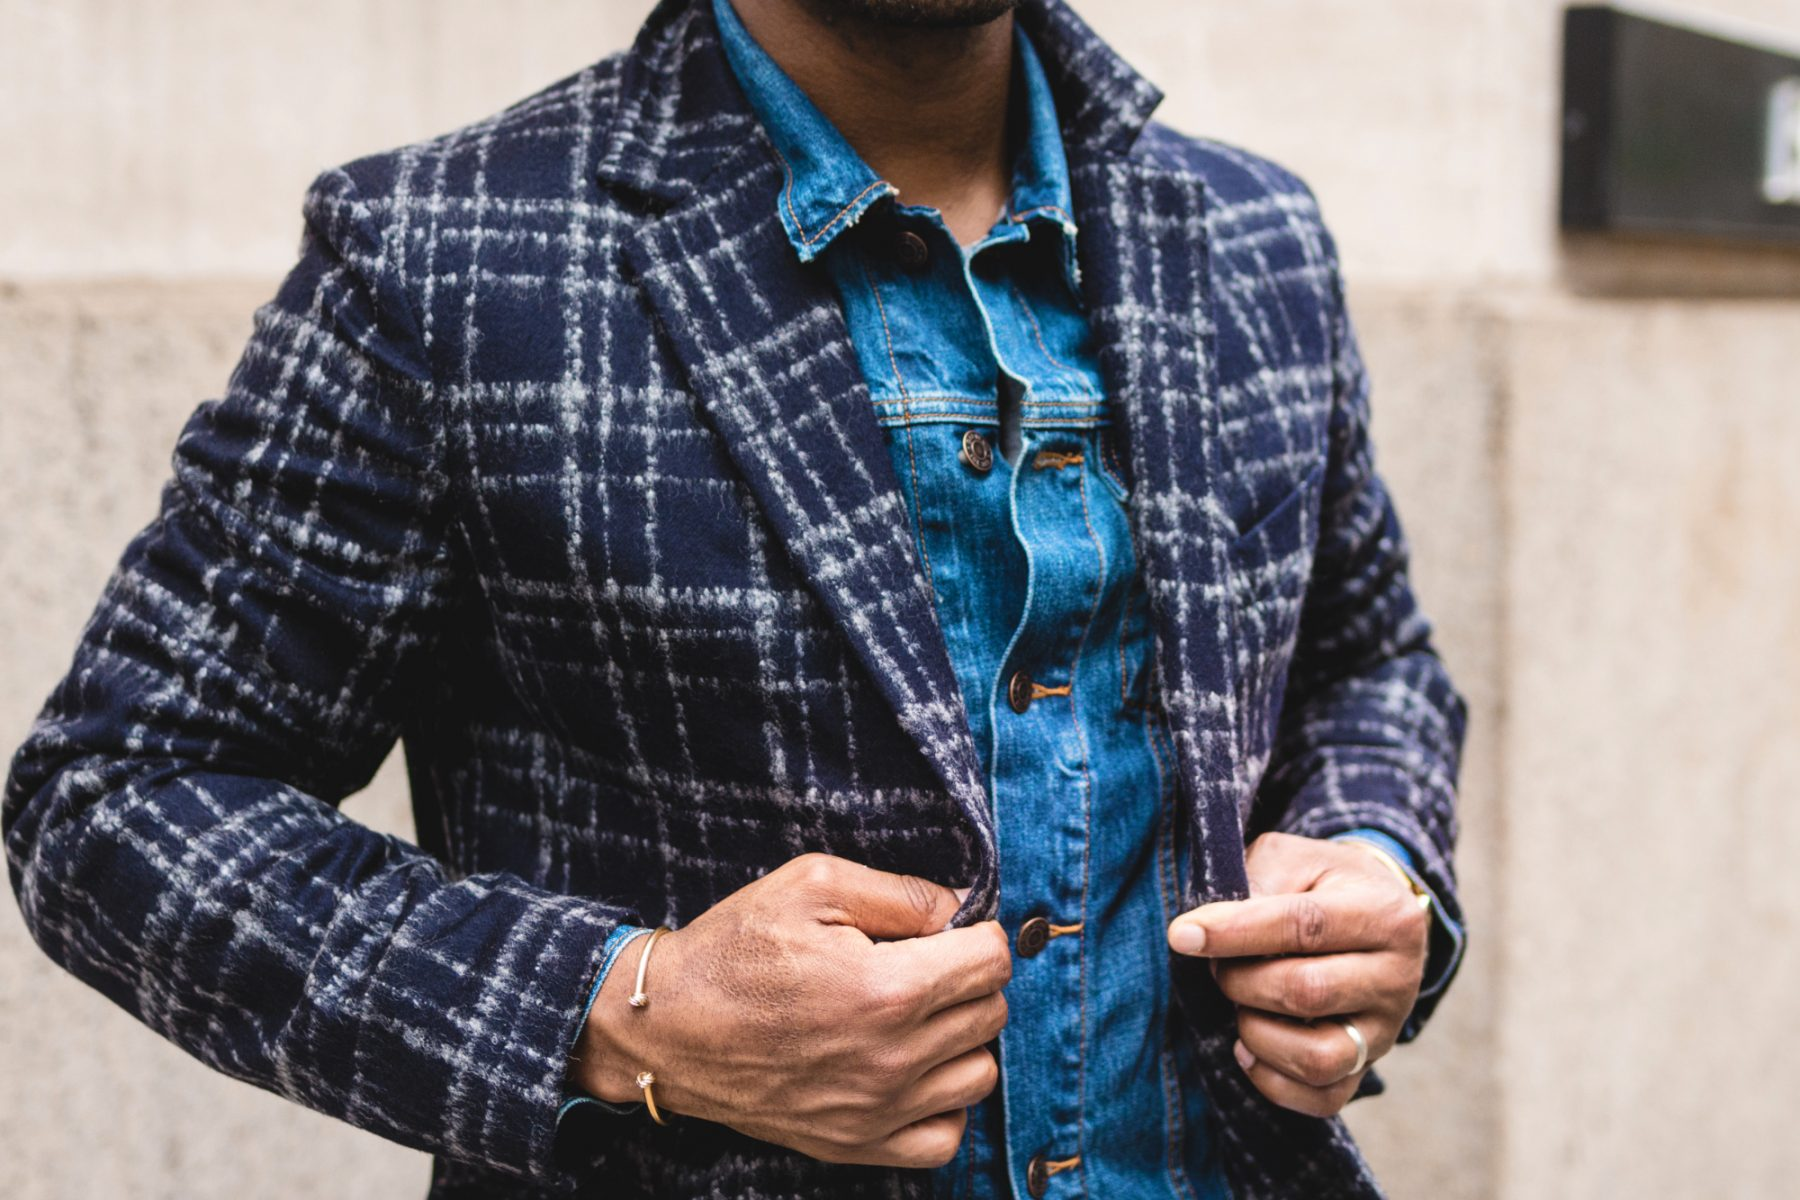 Sabir M. Peele of Men's style Pro in Hardy Amies Windowpane Topcoat